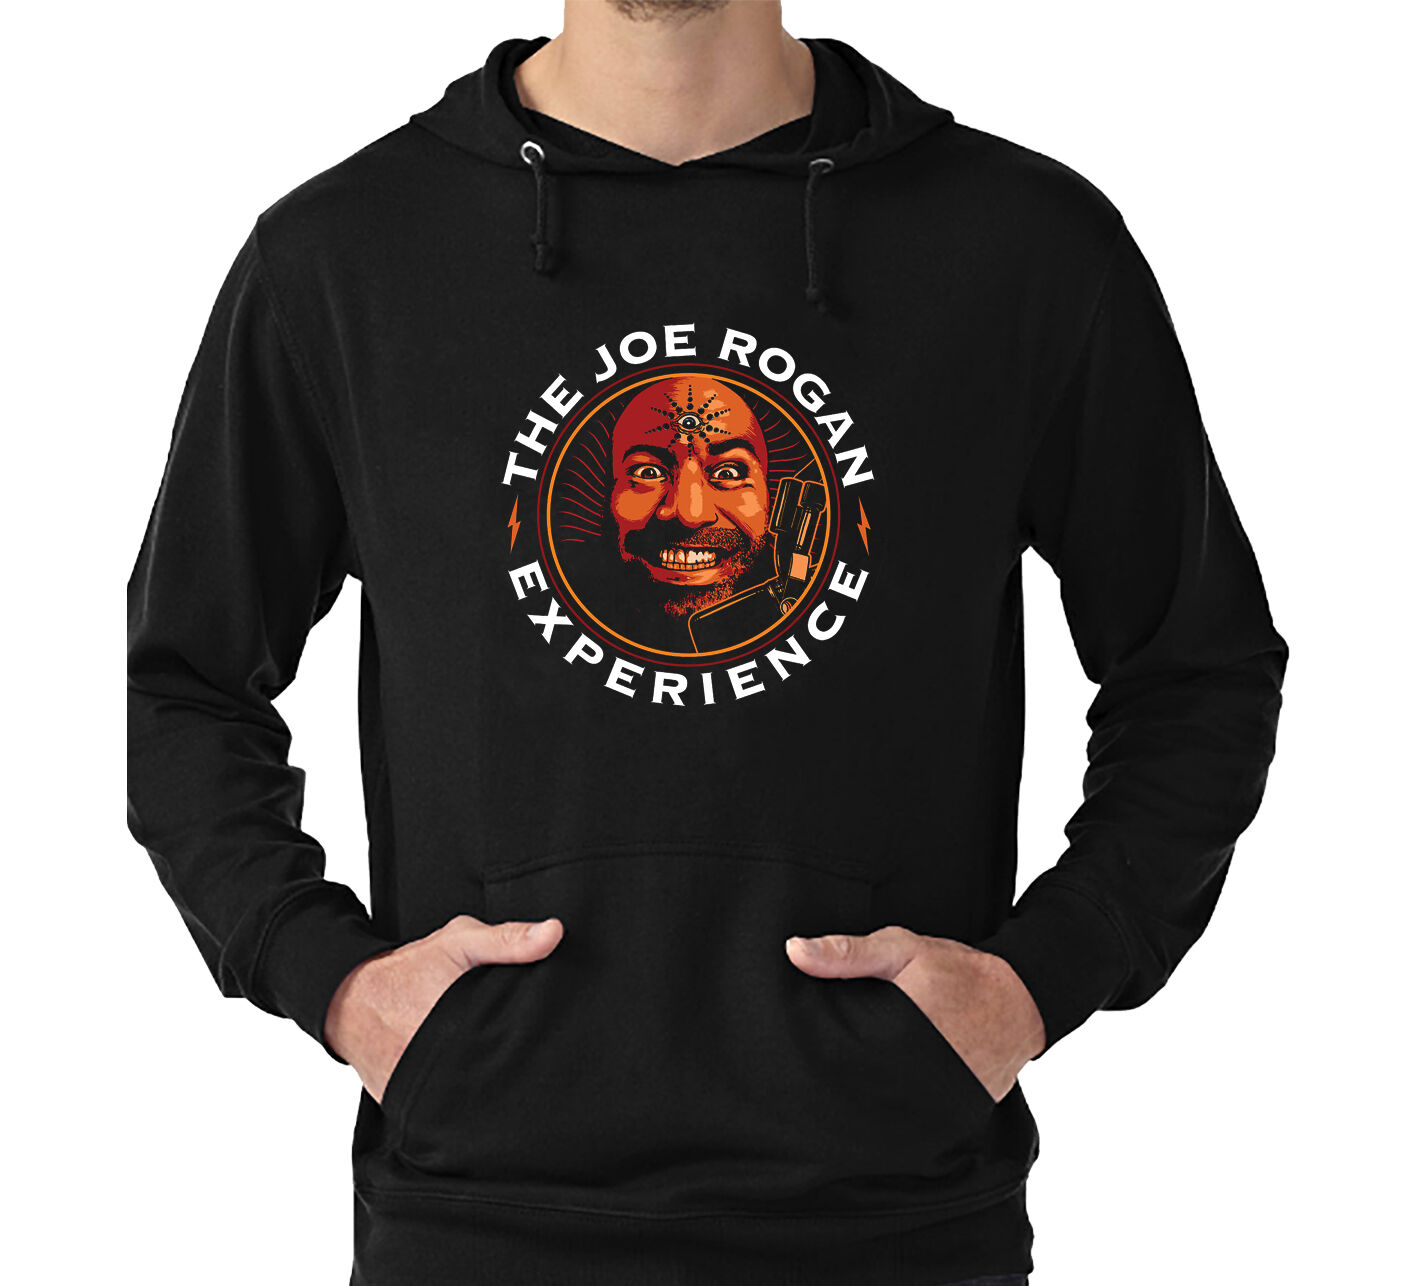 The Joe Rogan Experience Shirts